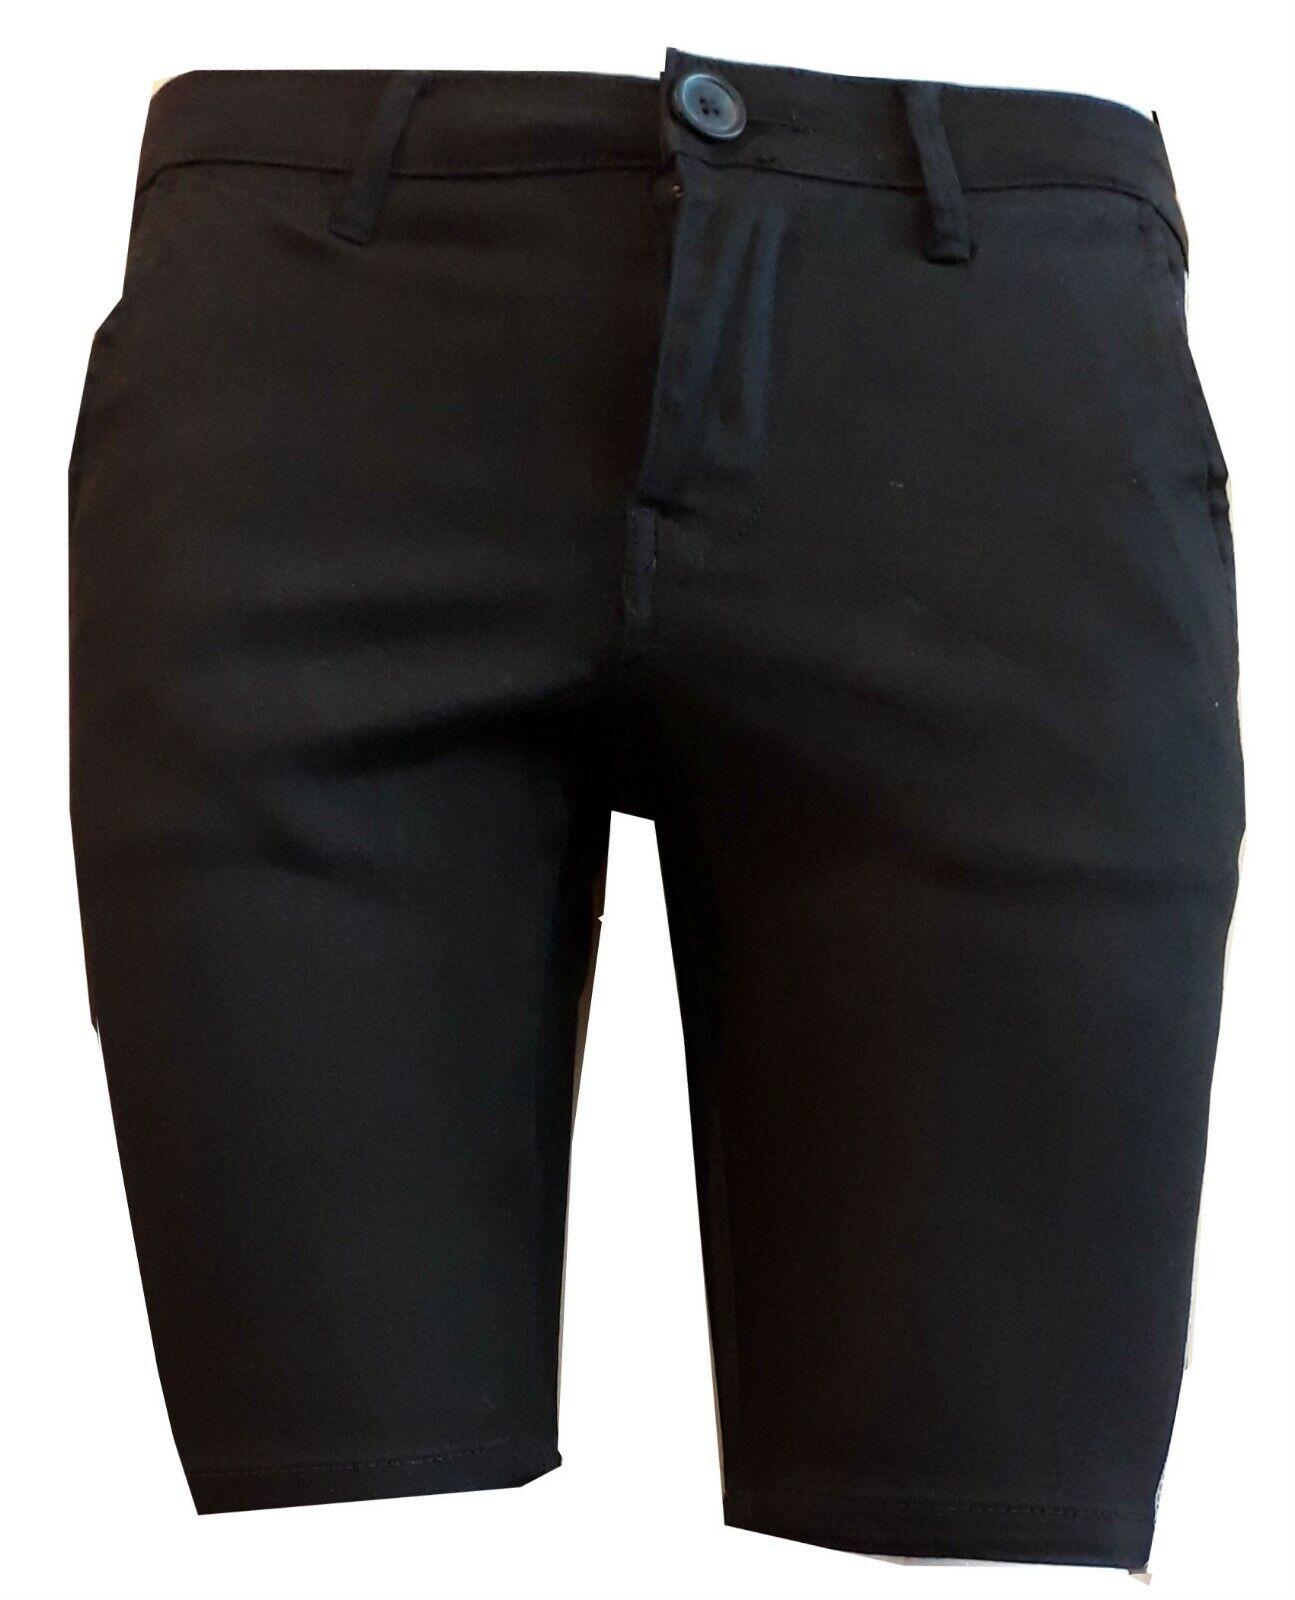 Mens Chino Shorts Slim Fit Stretch Designer summer wear W28 to W40